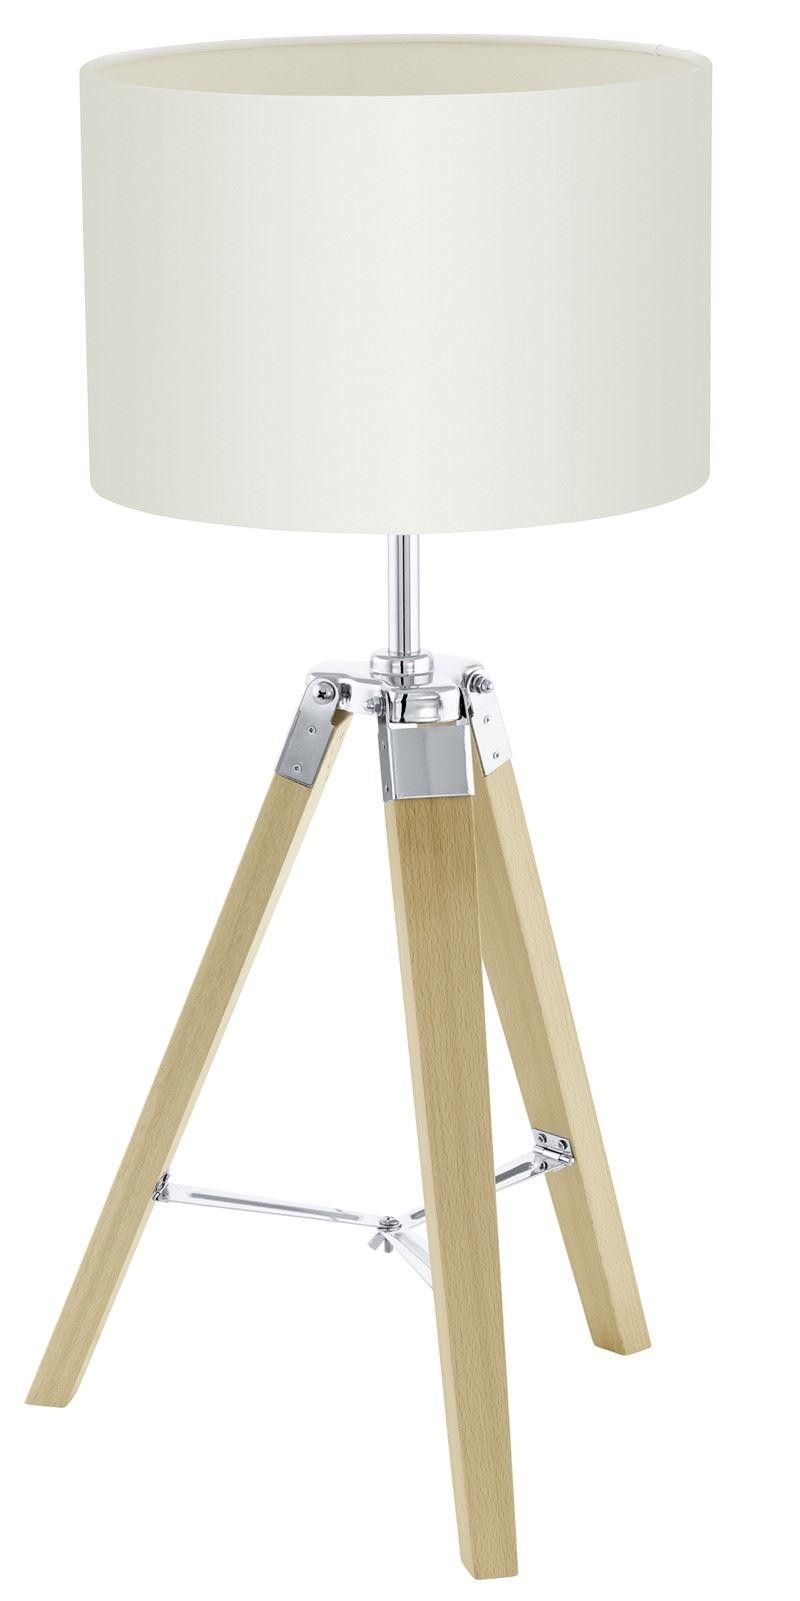 Lantada Modern Table Lamp 1 Light Natural Fabric Beige Shade